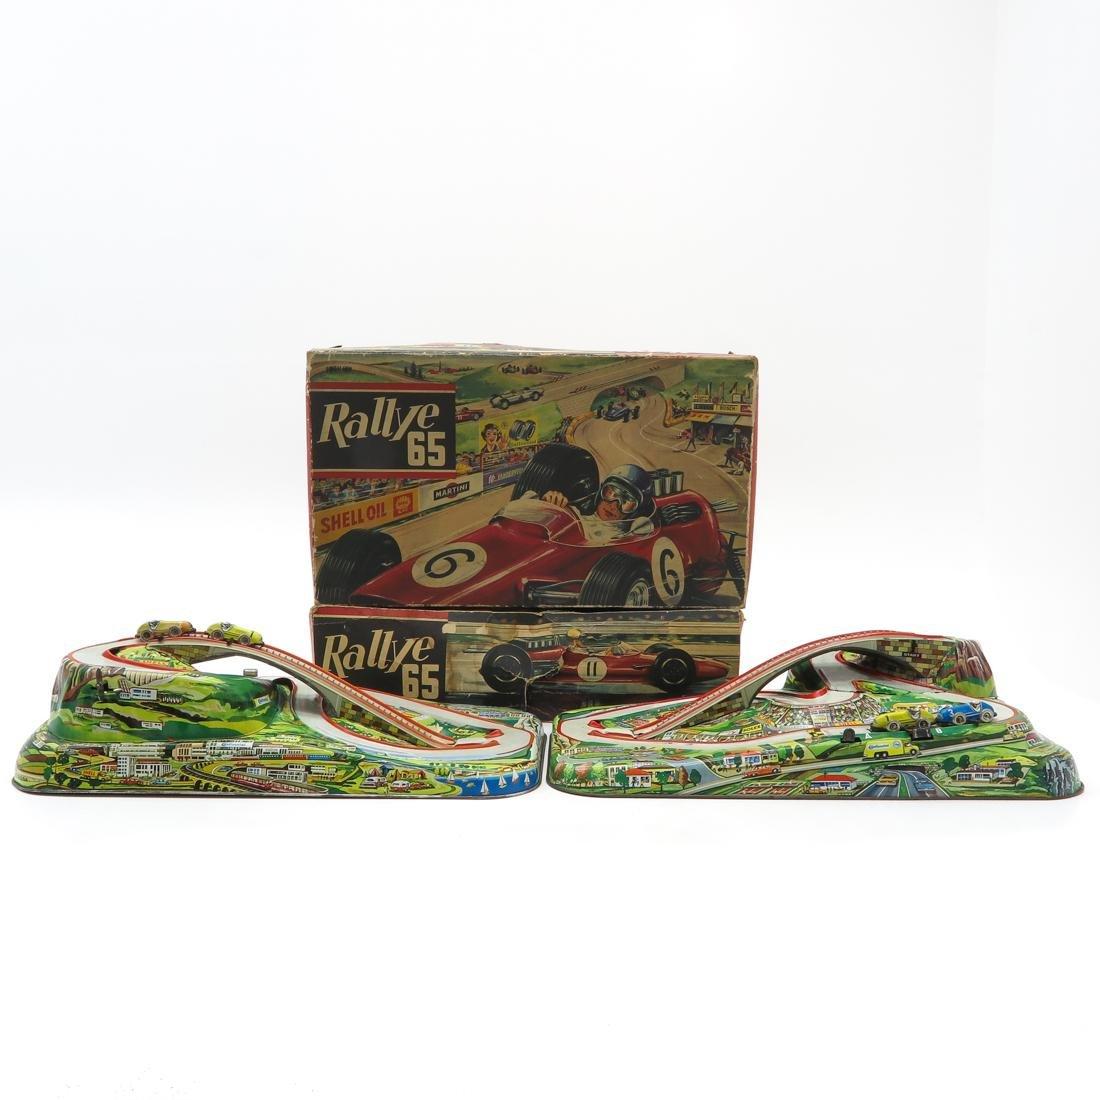 Lot of 2 Vintage Rallye 65 Tin Racetracks